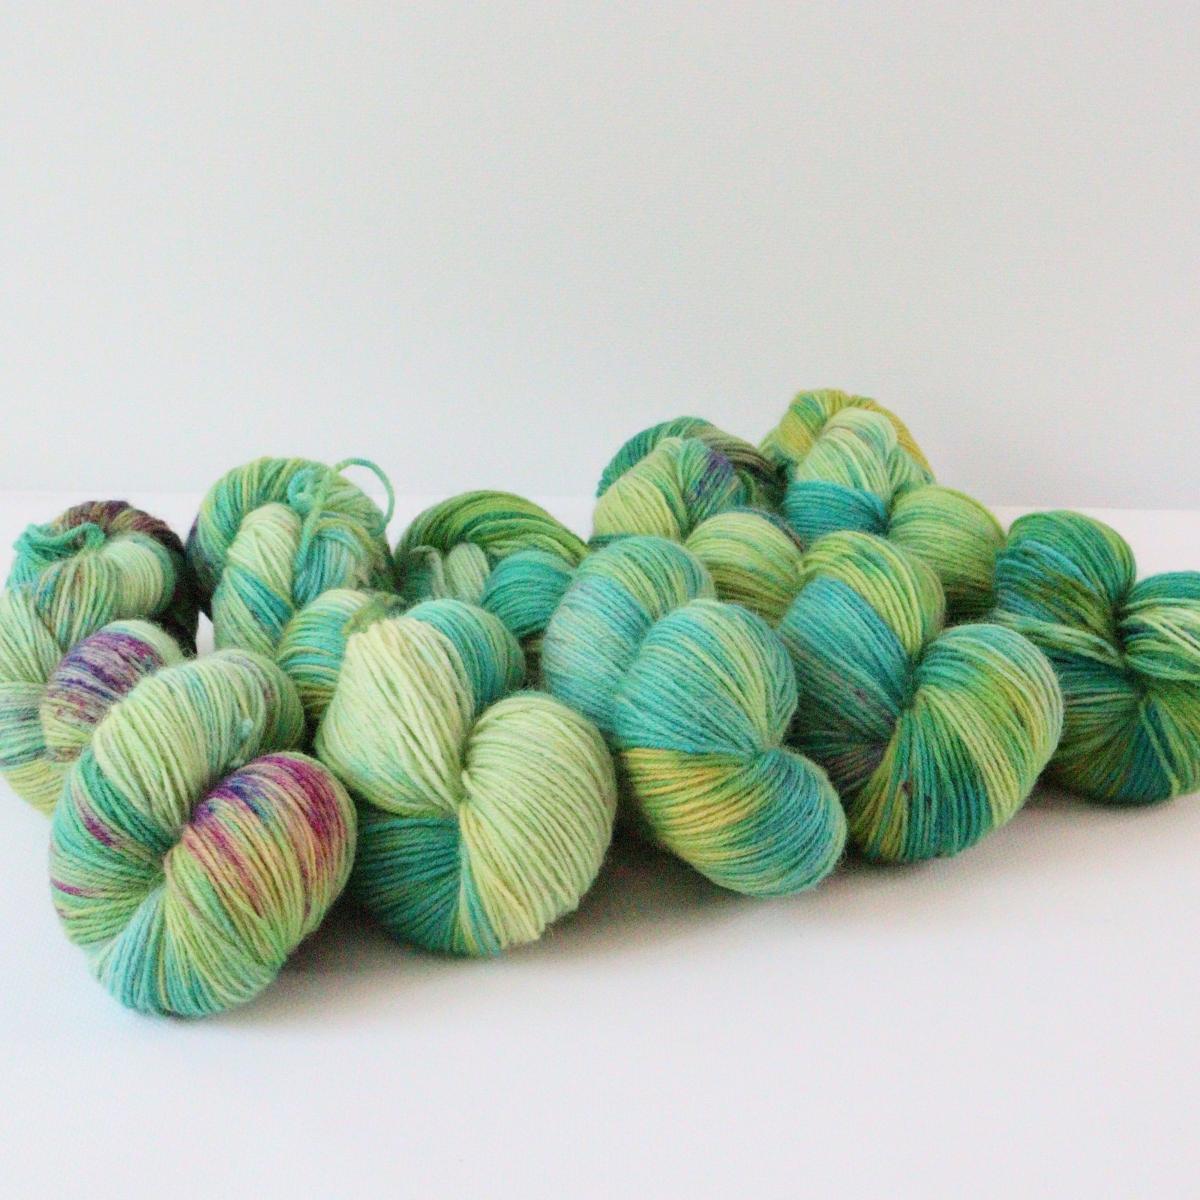 woodico.pro hand dyed yarn 080 1 1200x1200 - Hand dyed yarn / 080